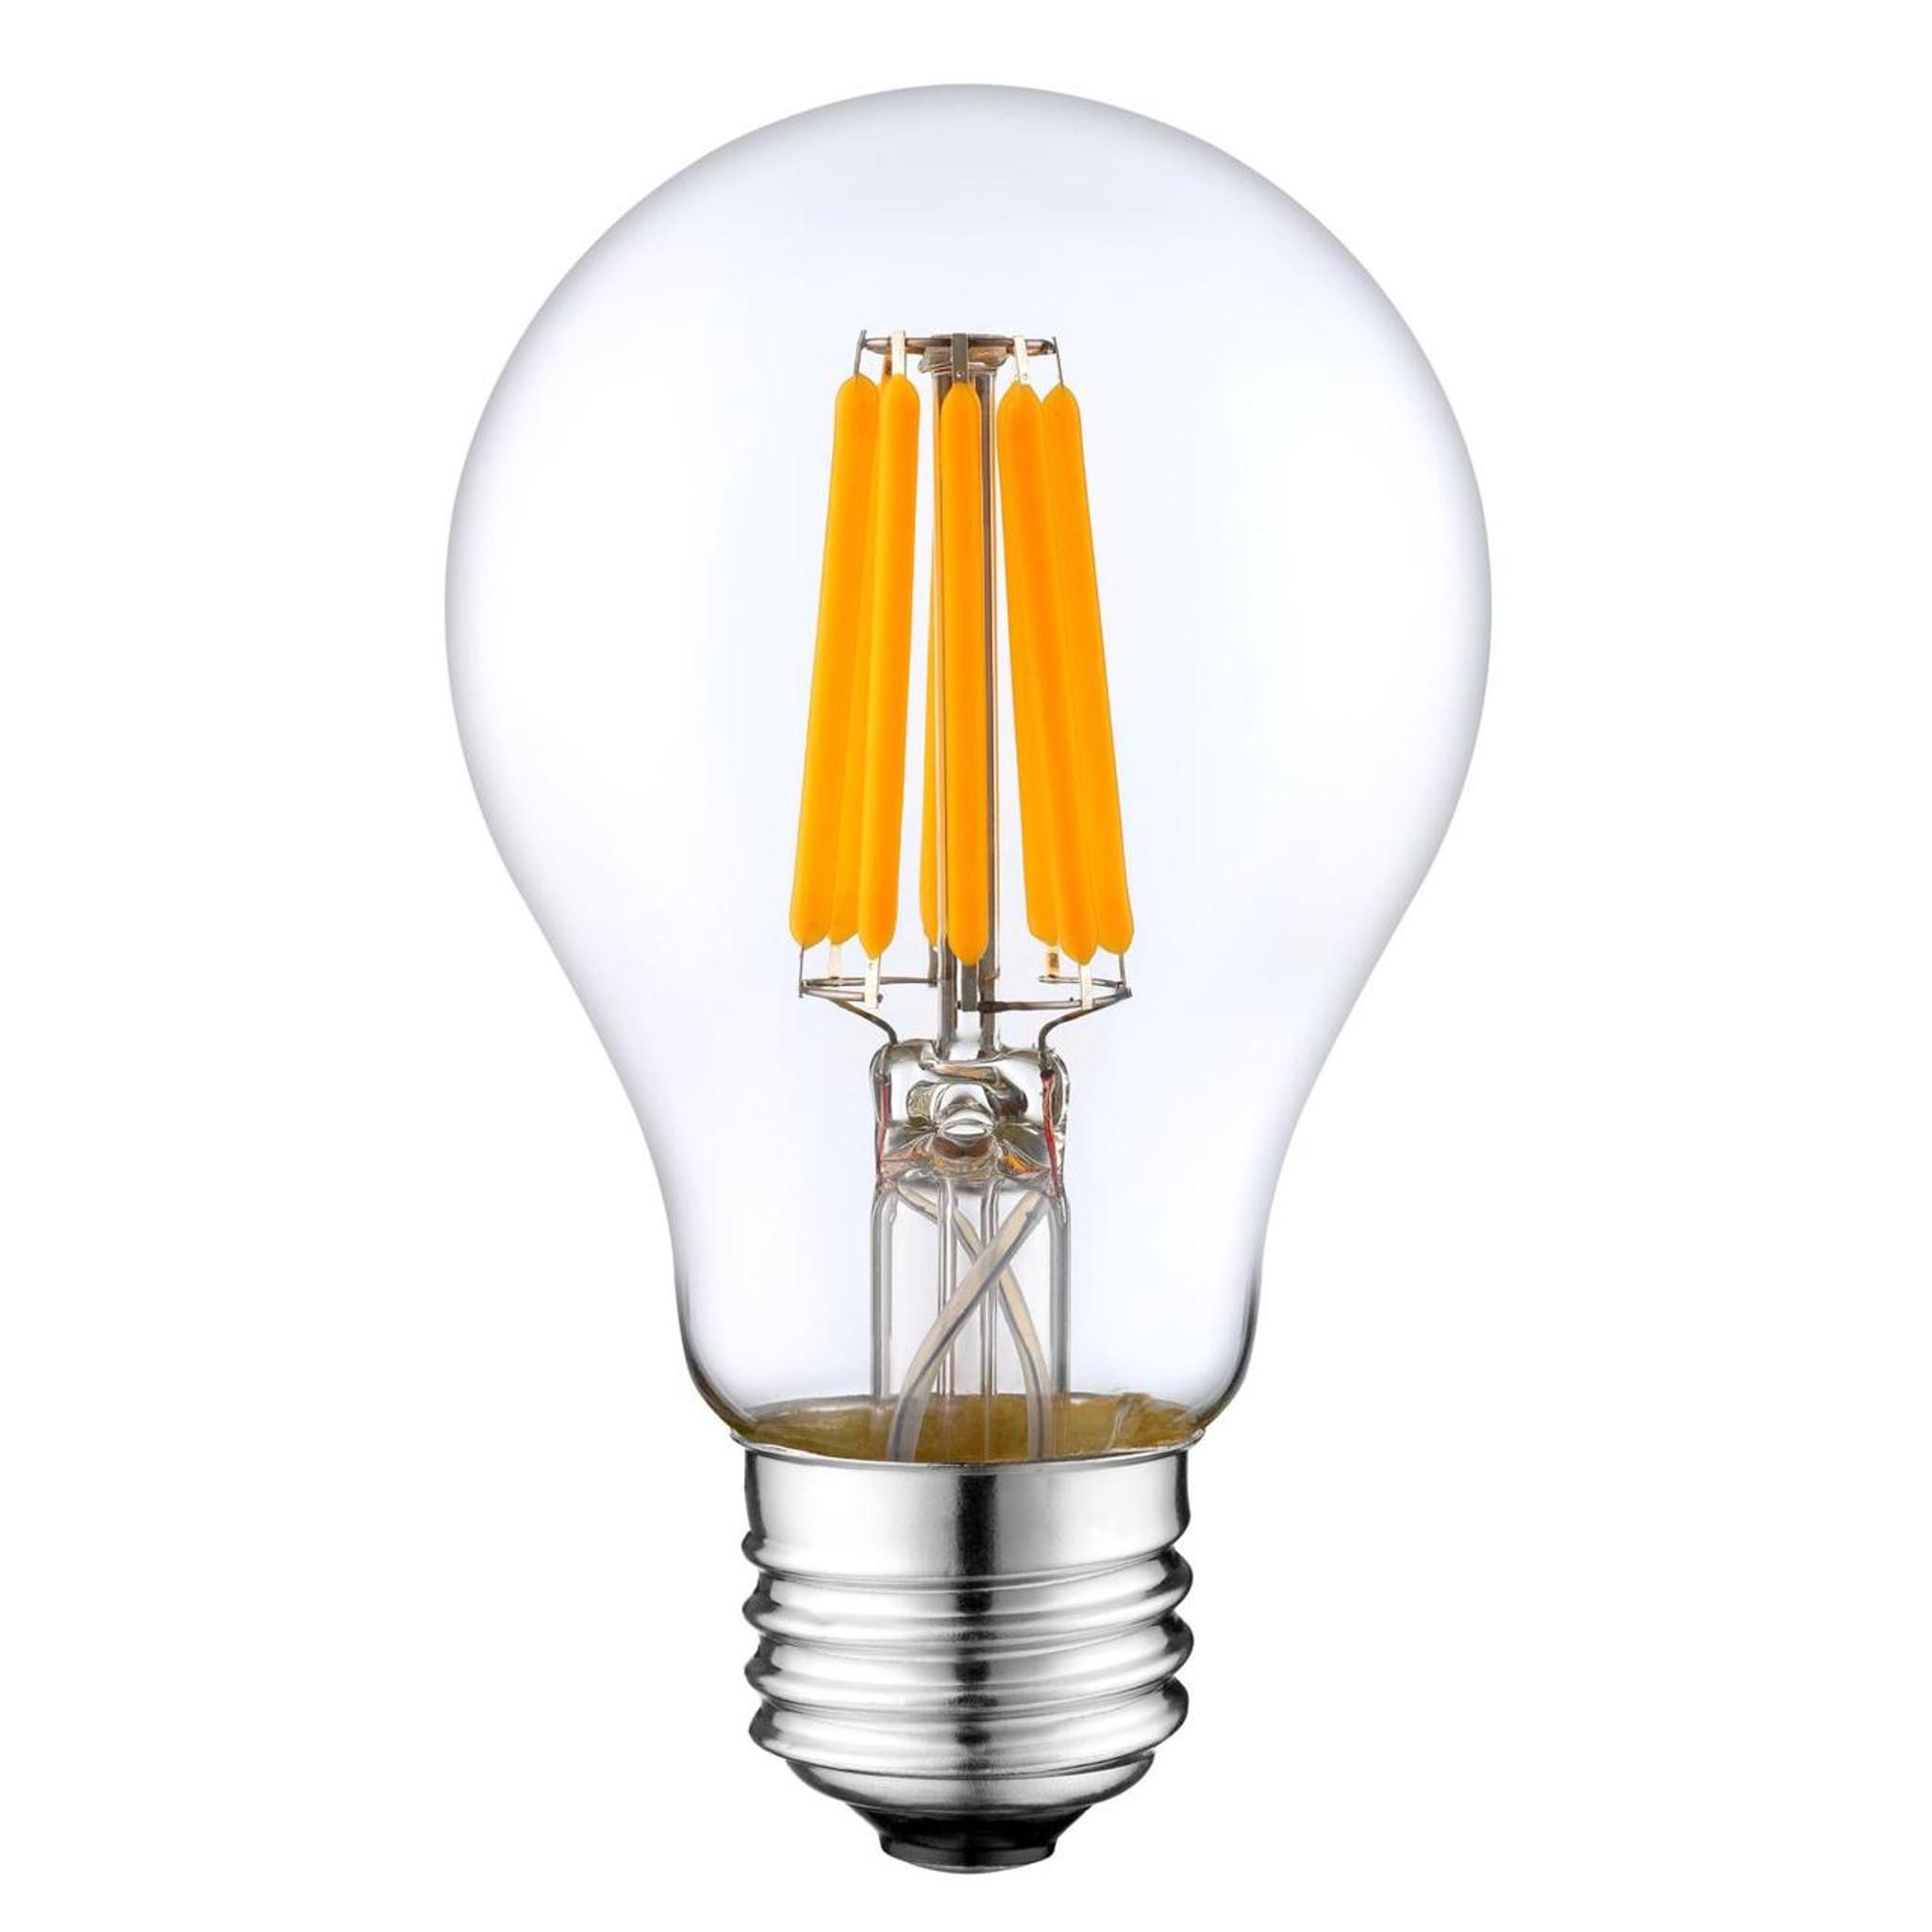 8w a19 led edison bulb